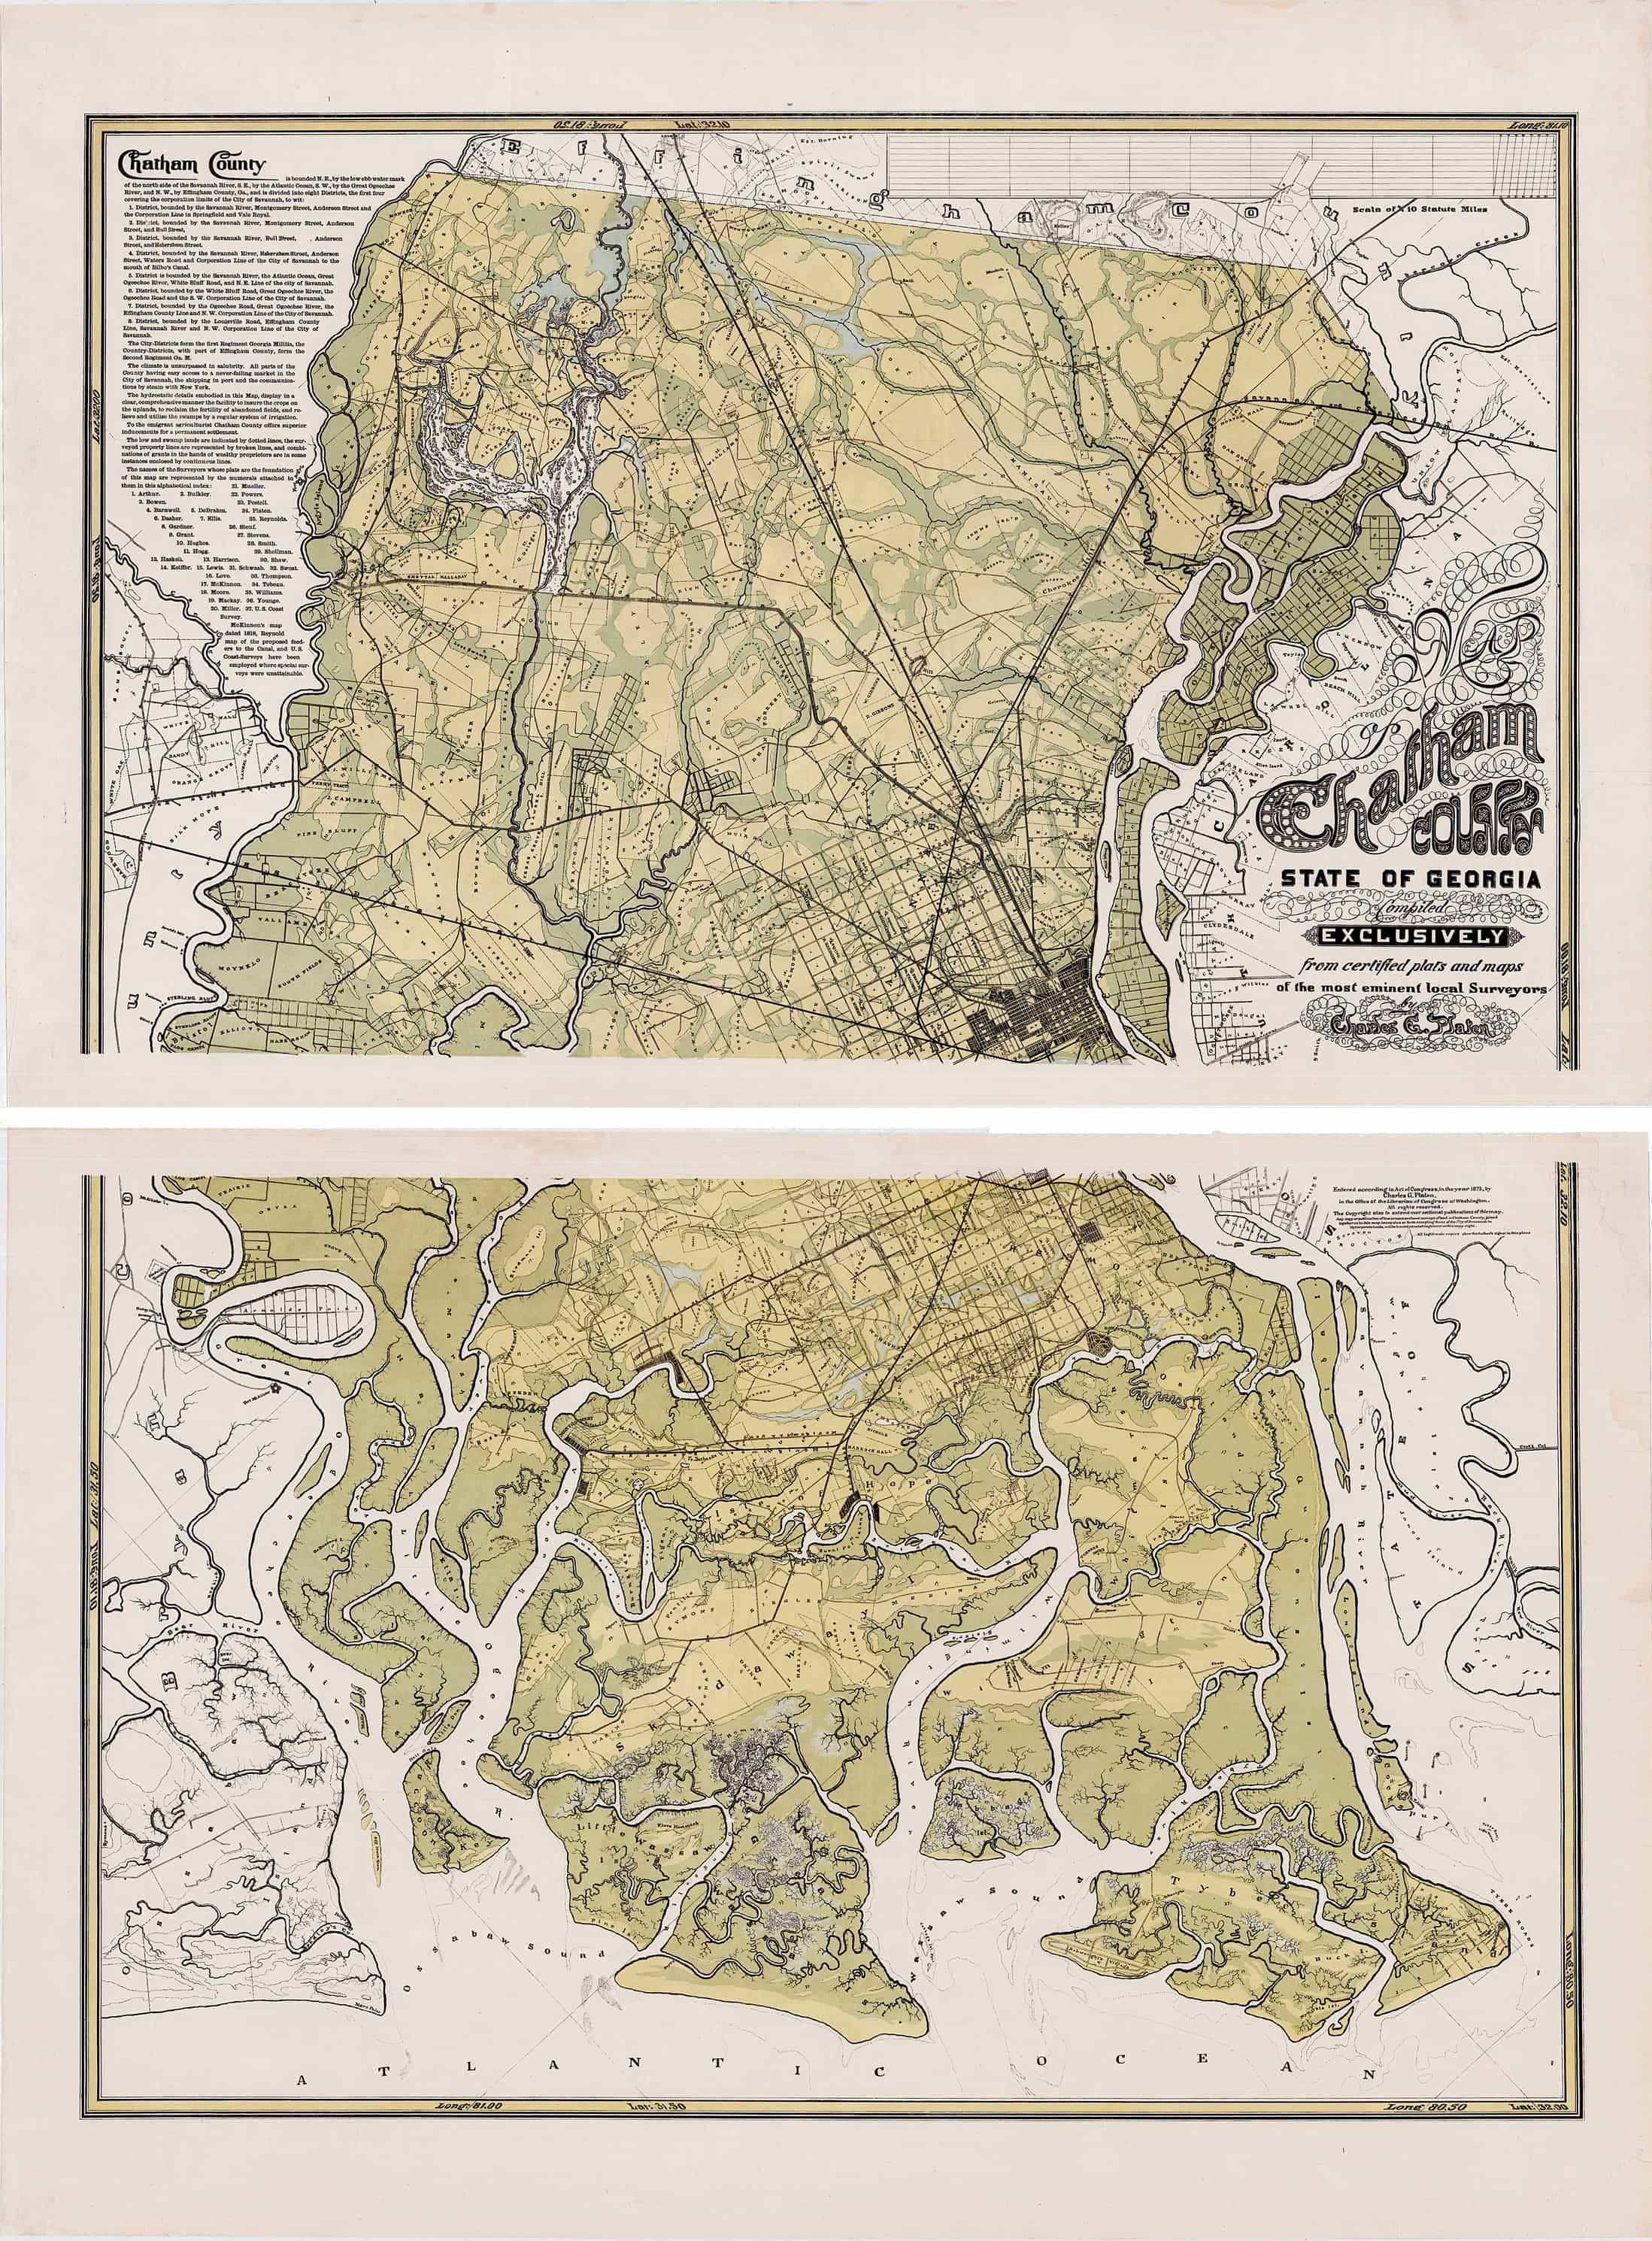 A Rare And Impressive Map Of Chatham County Georgia